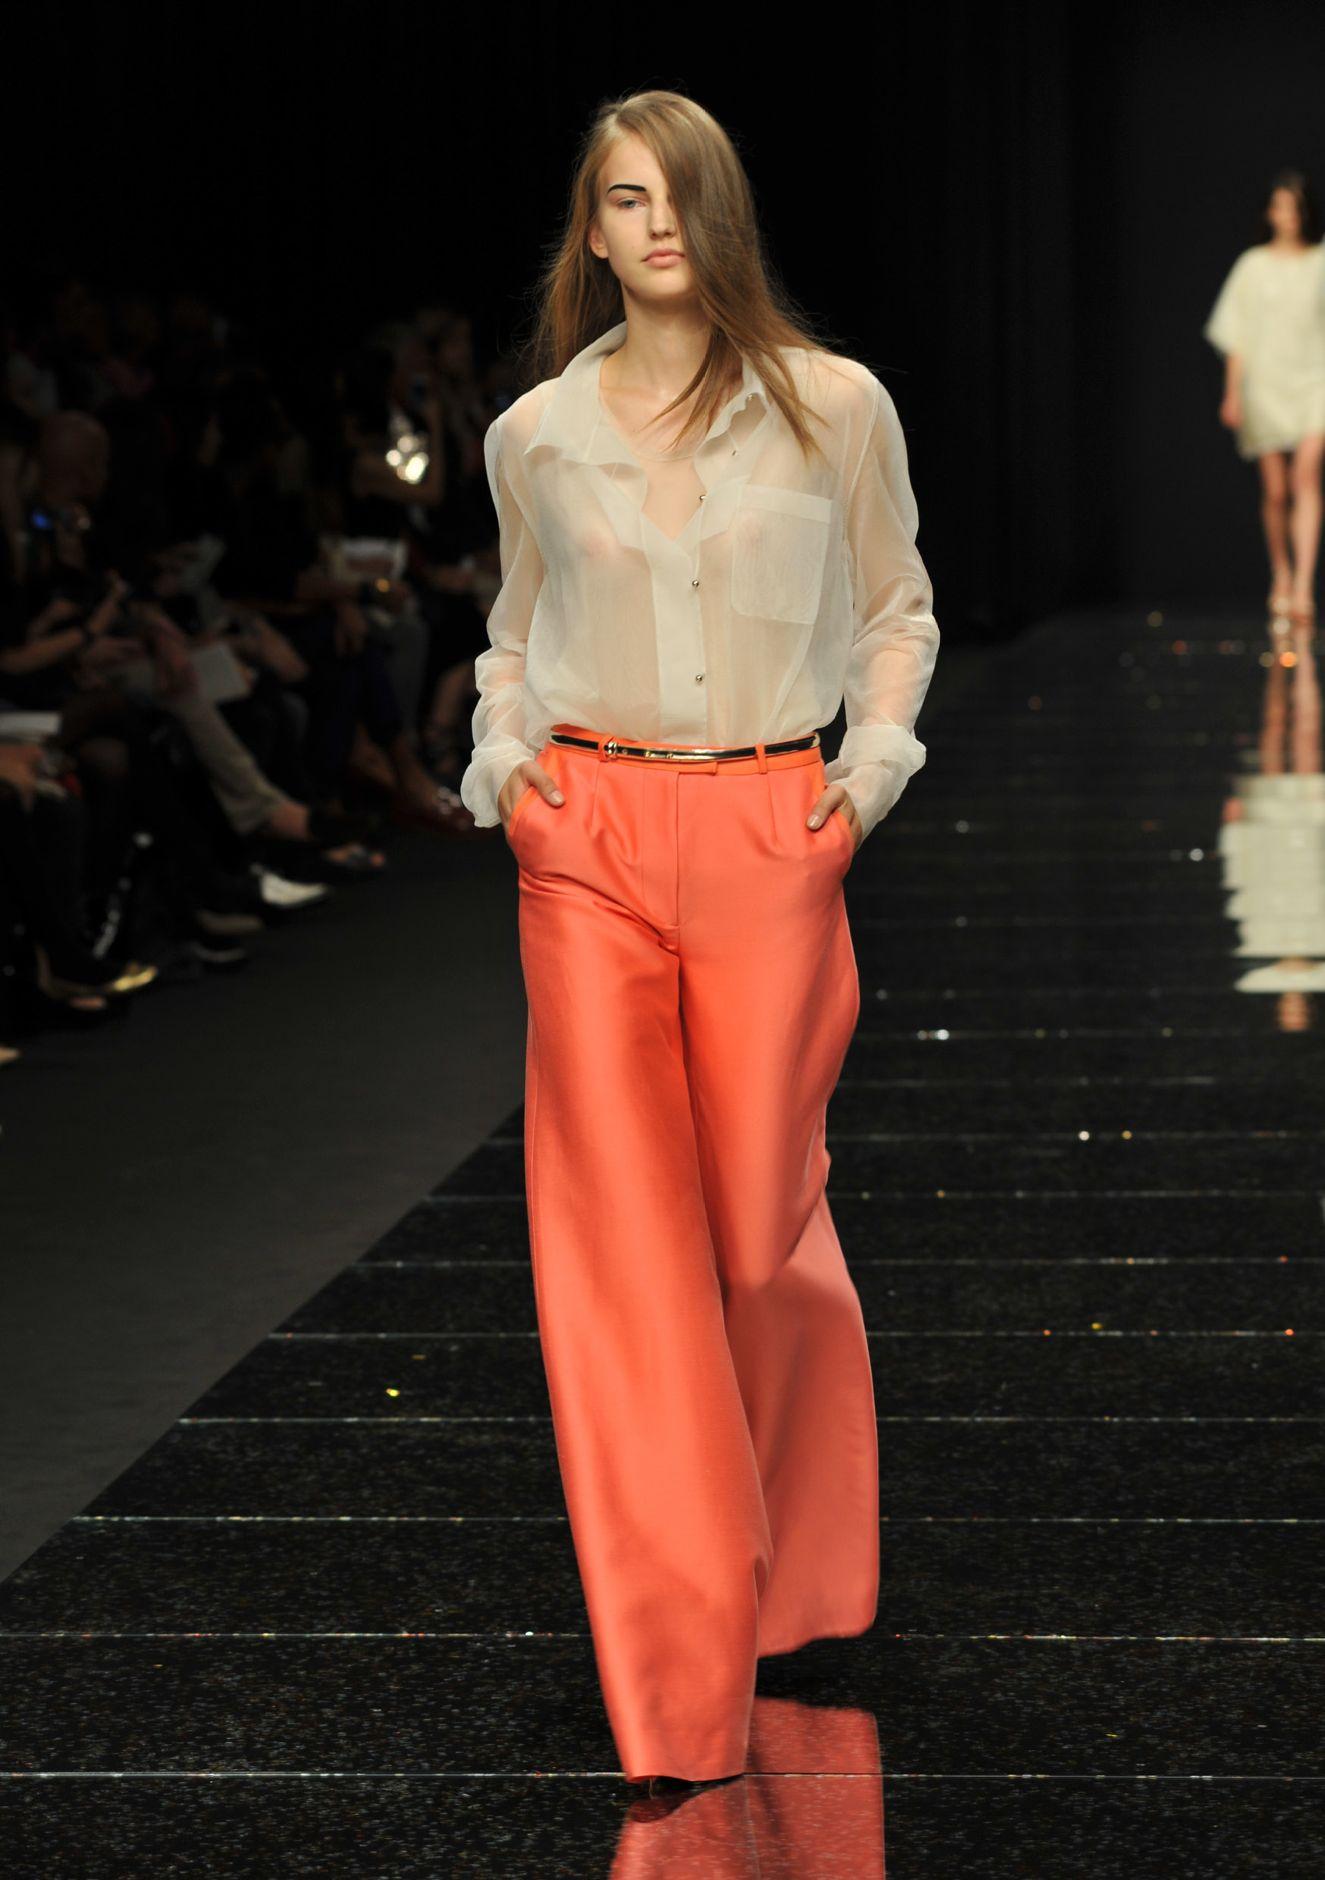 Spring 2013 Fashion Show Anteprima